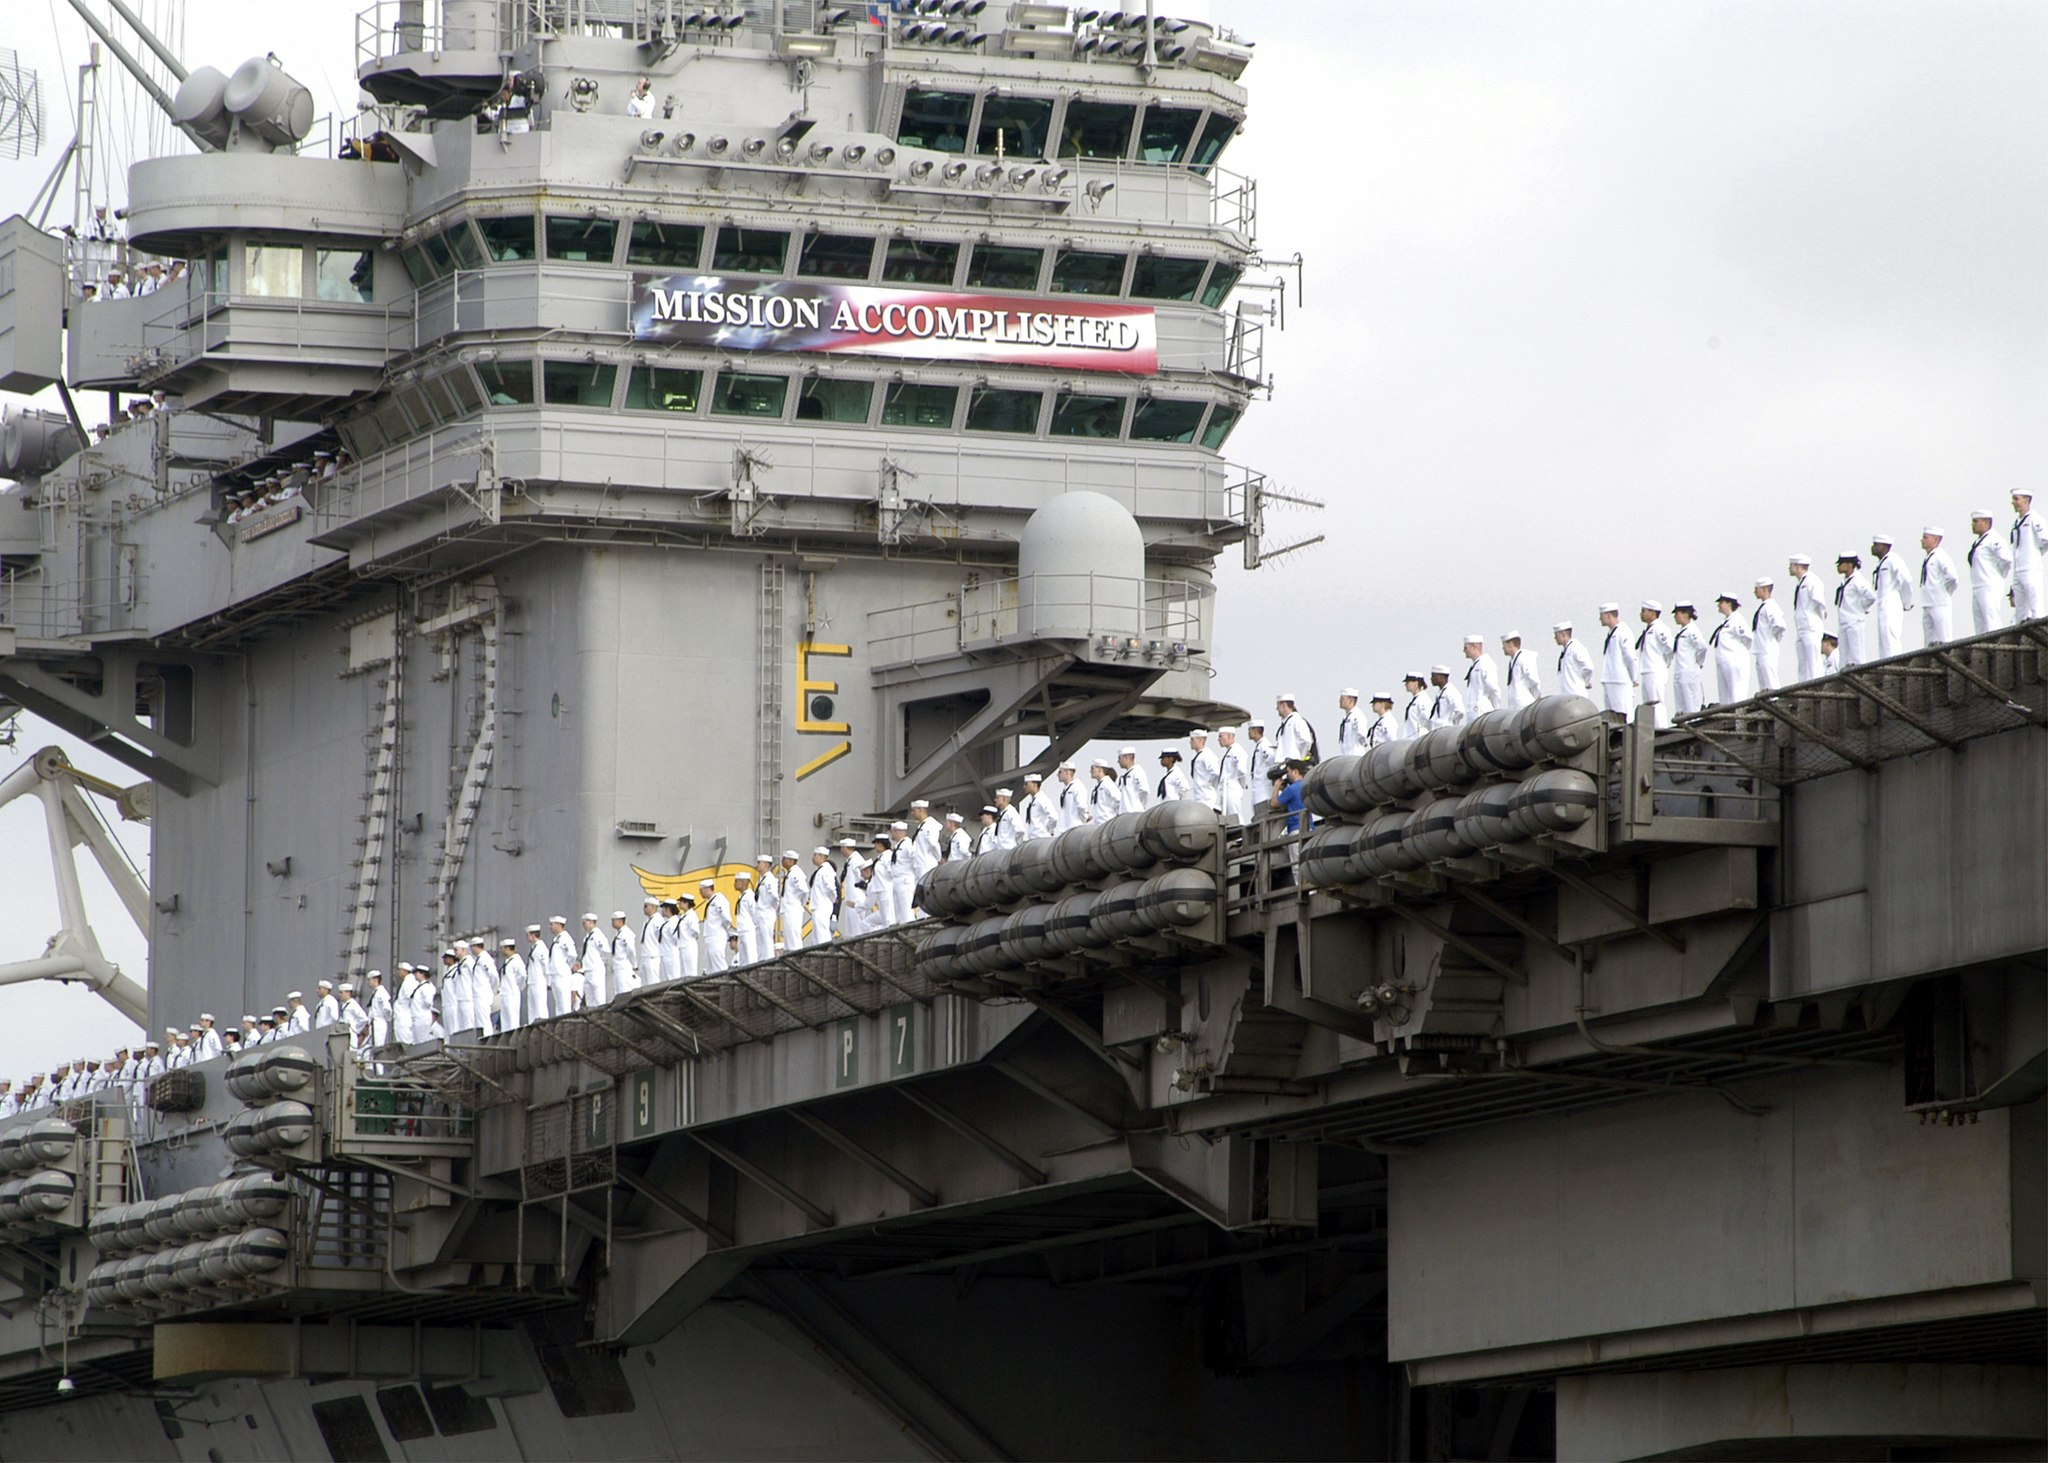 U.S. Navy photo by Photographer's Mate 3rd Class Juan E. Diaz. (RELEASED) [Public domain], via Wikimedia Commons